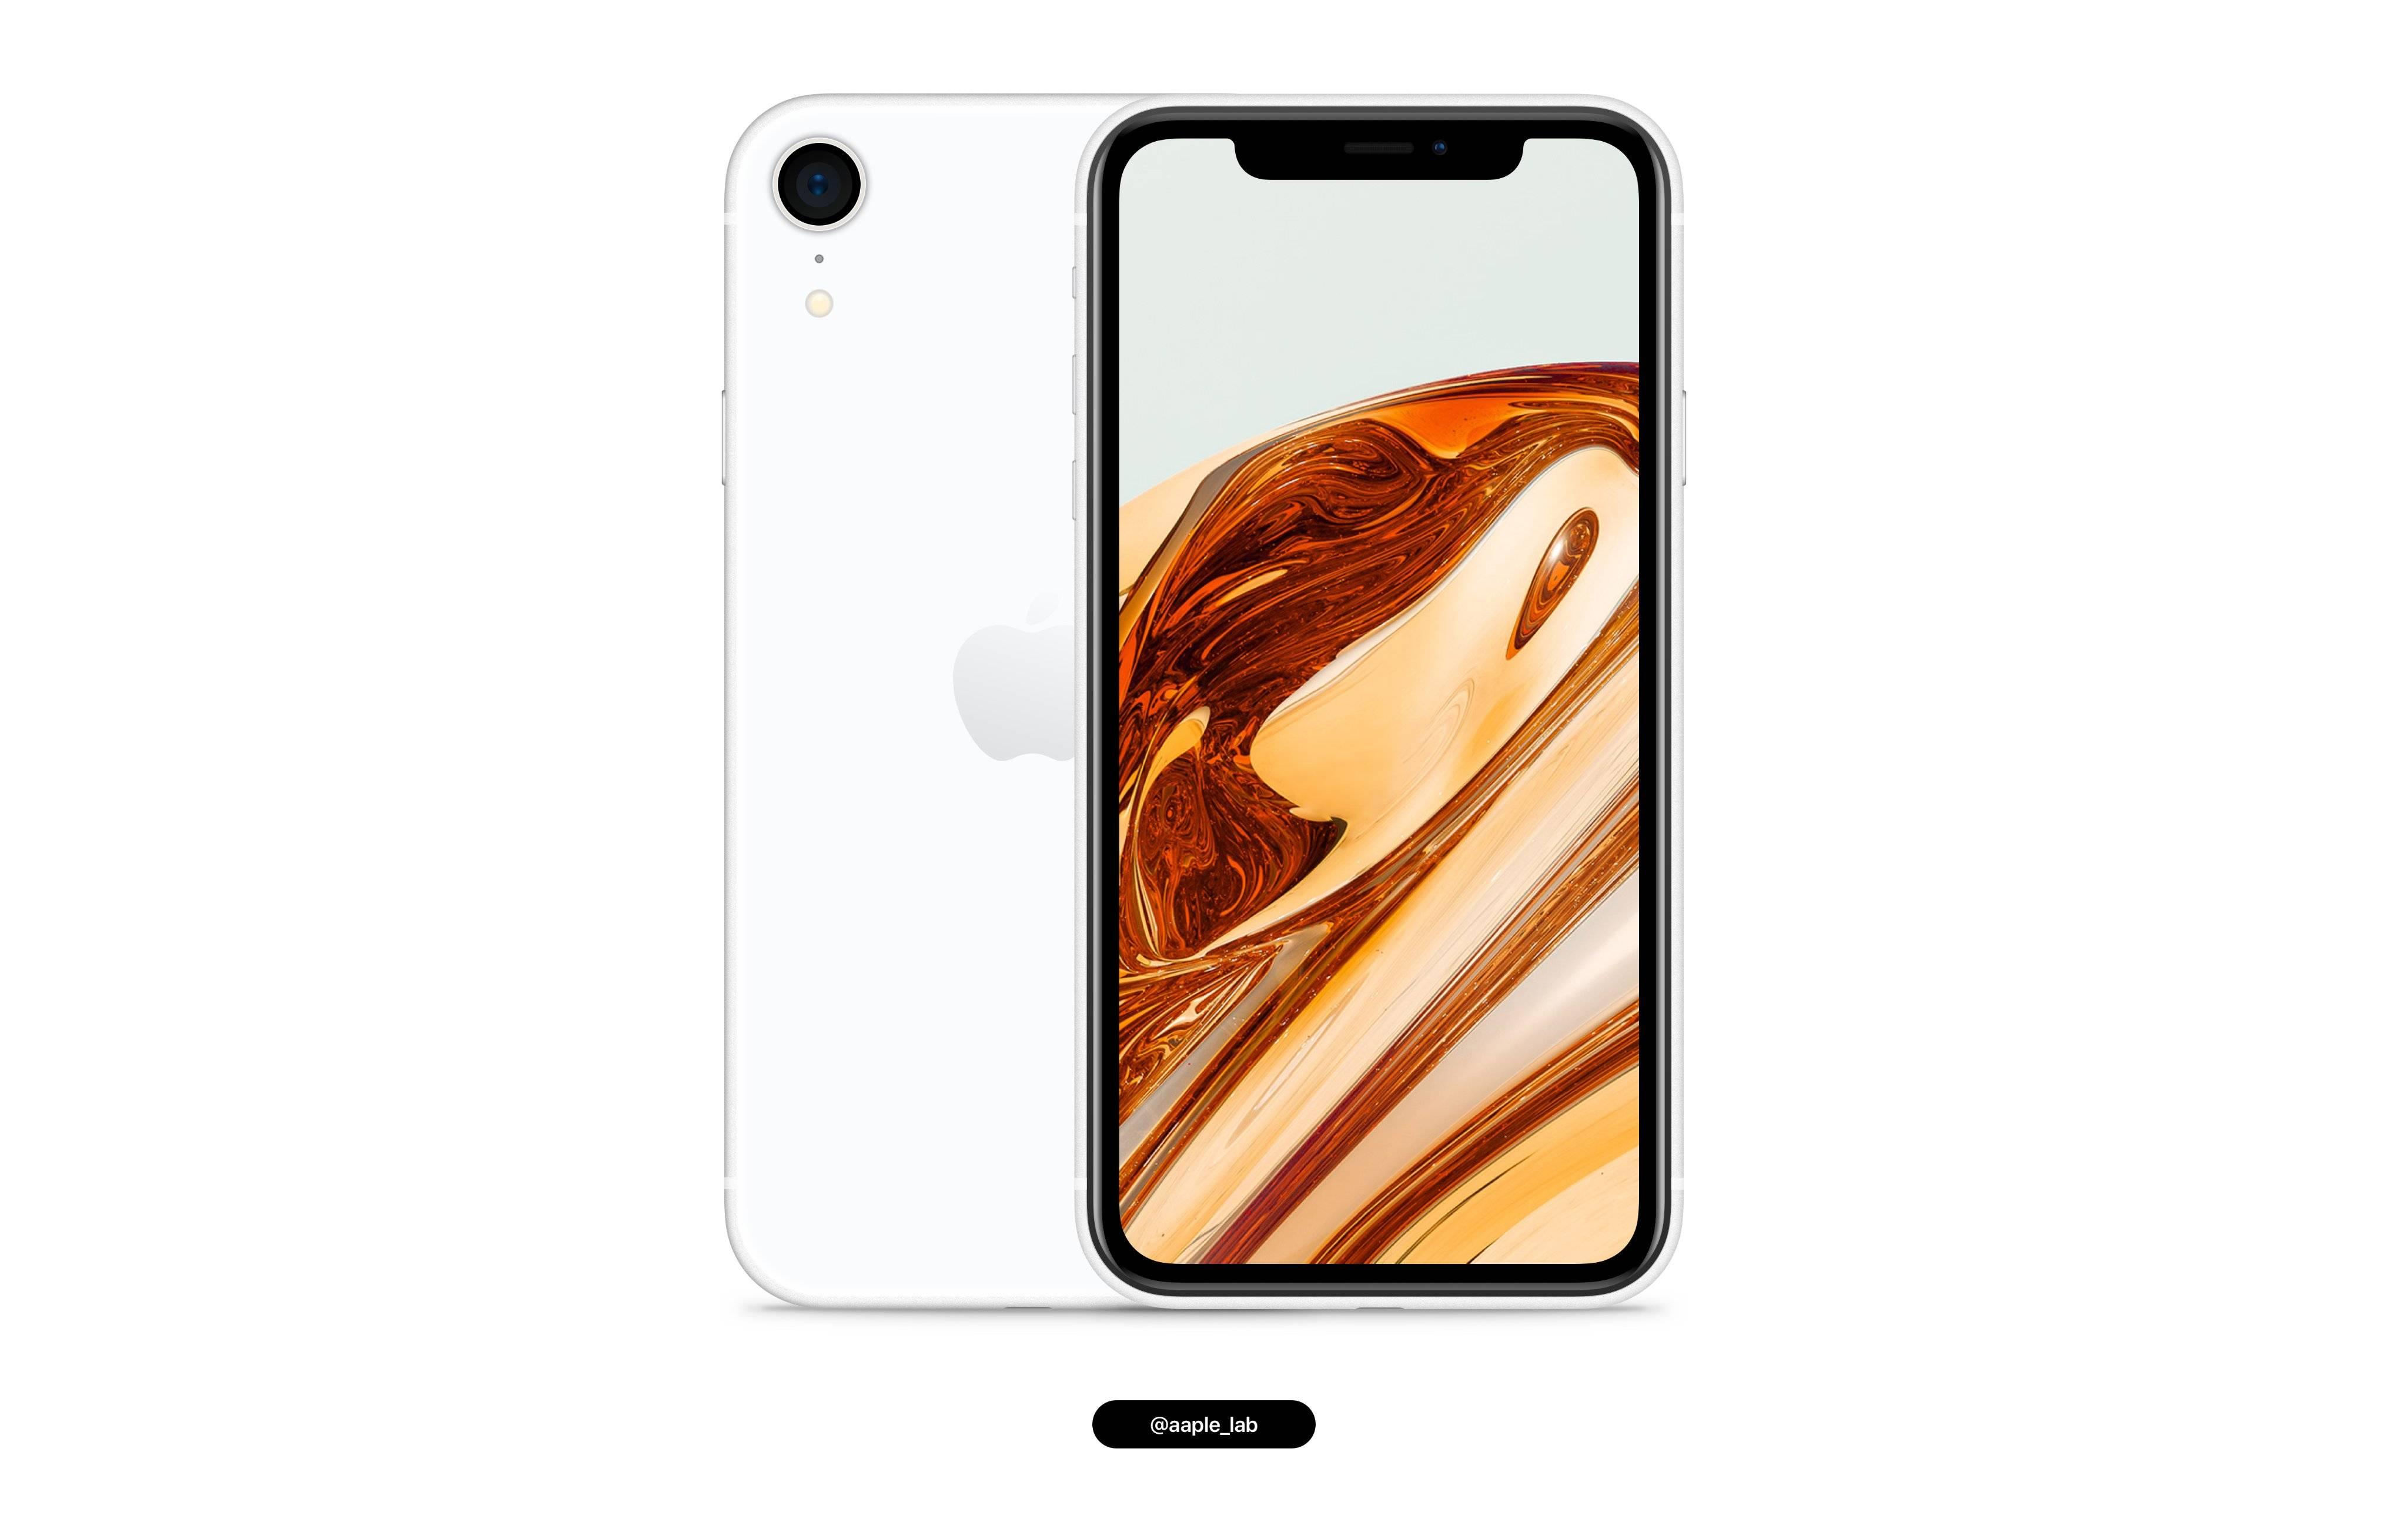 iPhone SE Plus 概念设计:类似 iPhone XR,但采用侧面指纹